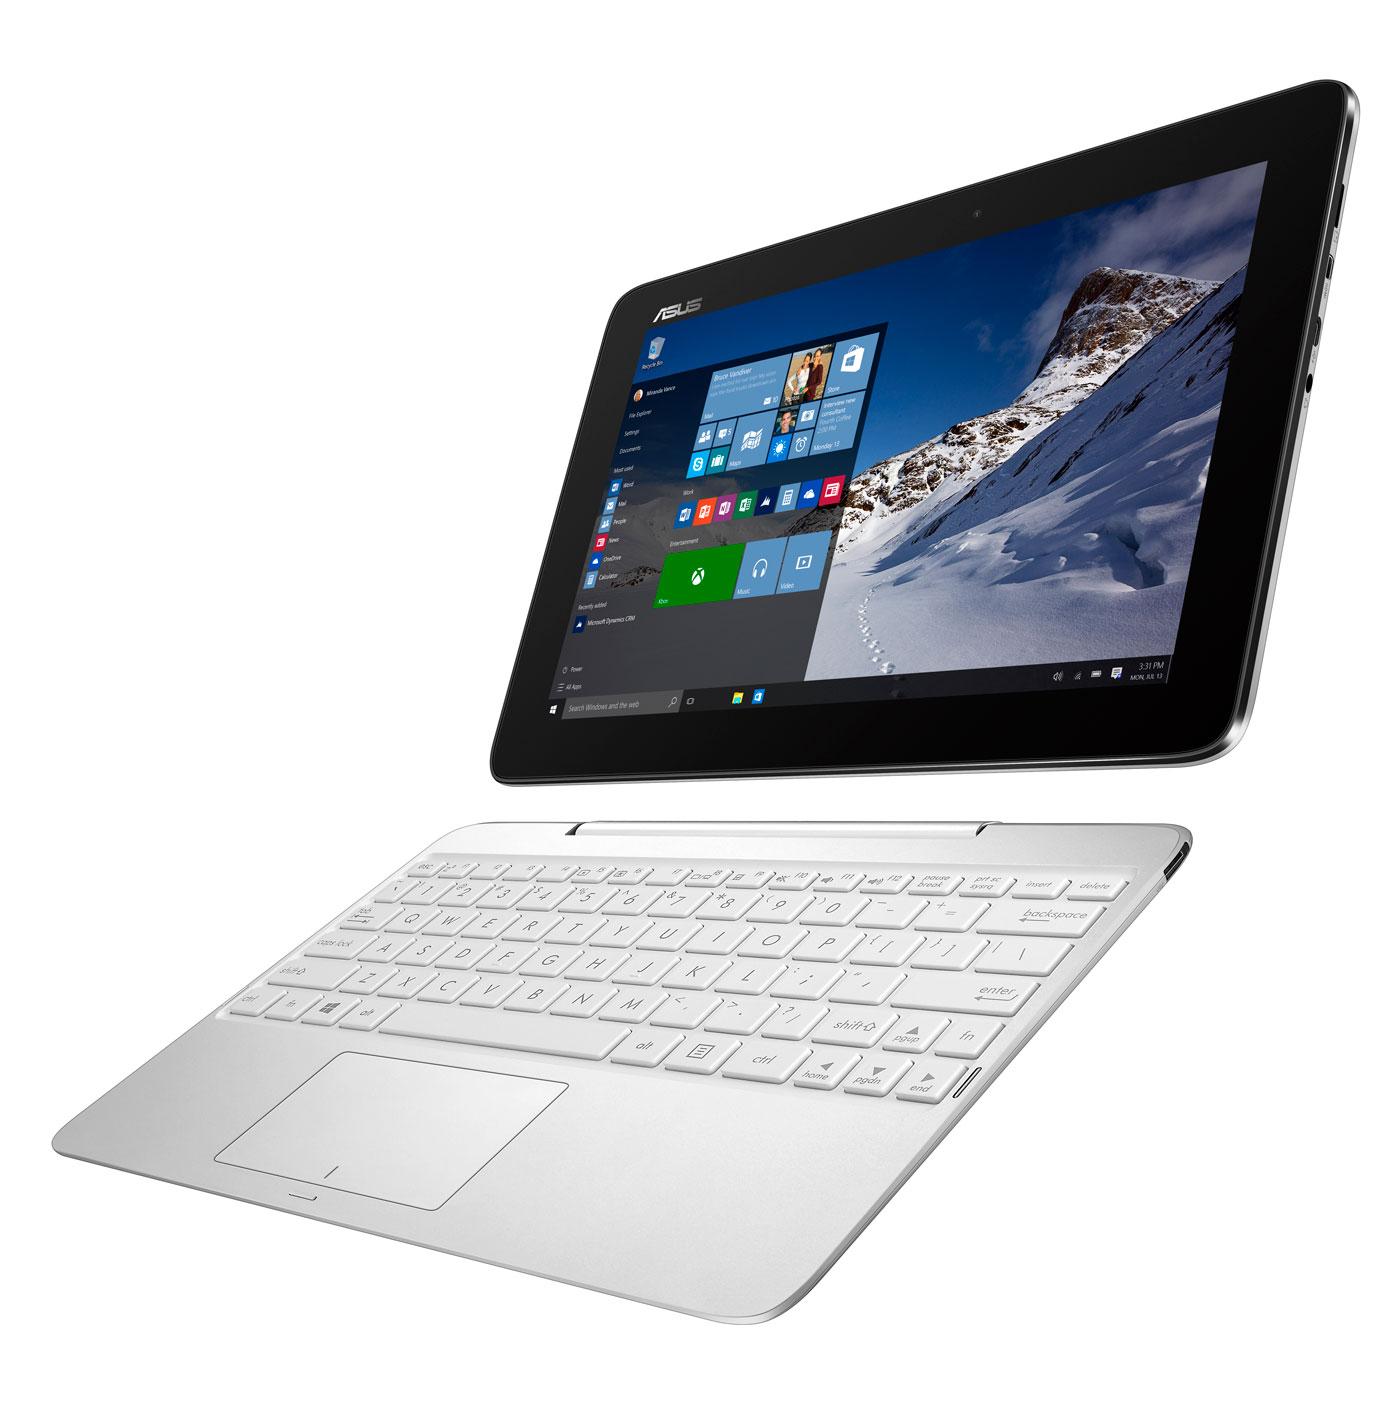 ASUS T100HA-FU026T x5-Z8500/64G EMMC/10,1'' WXGA/(1280x800)Win10/silk white